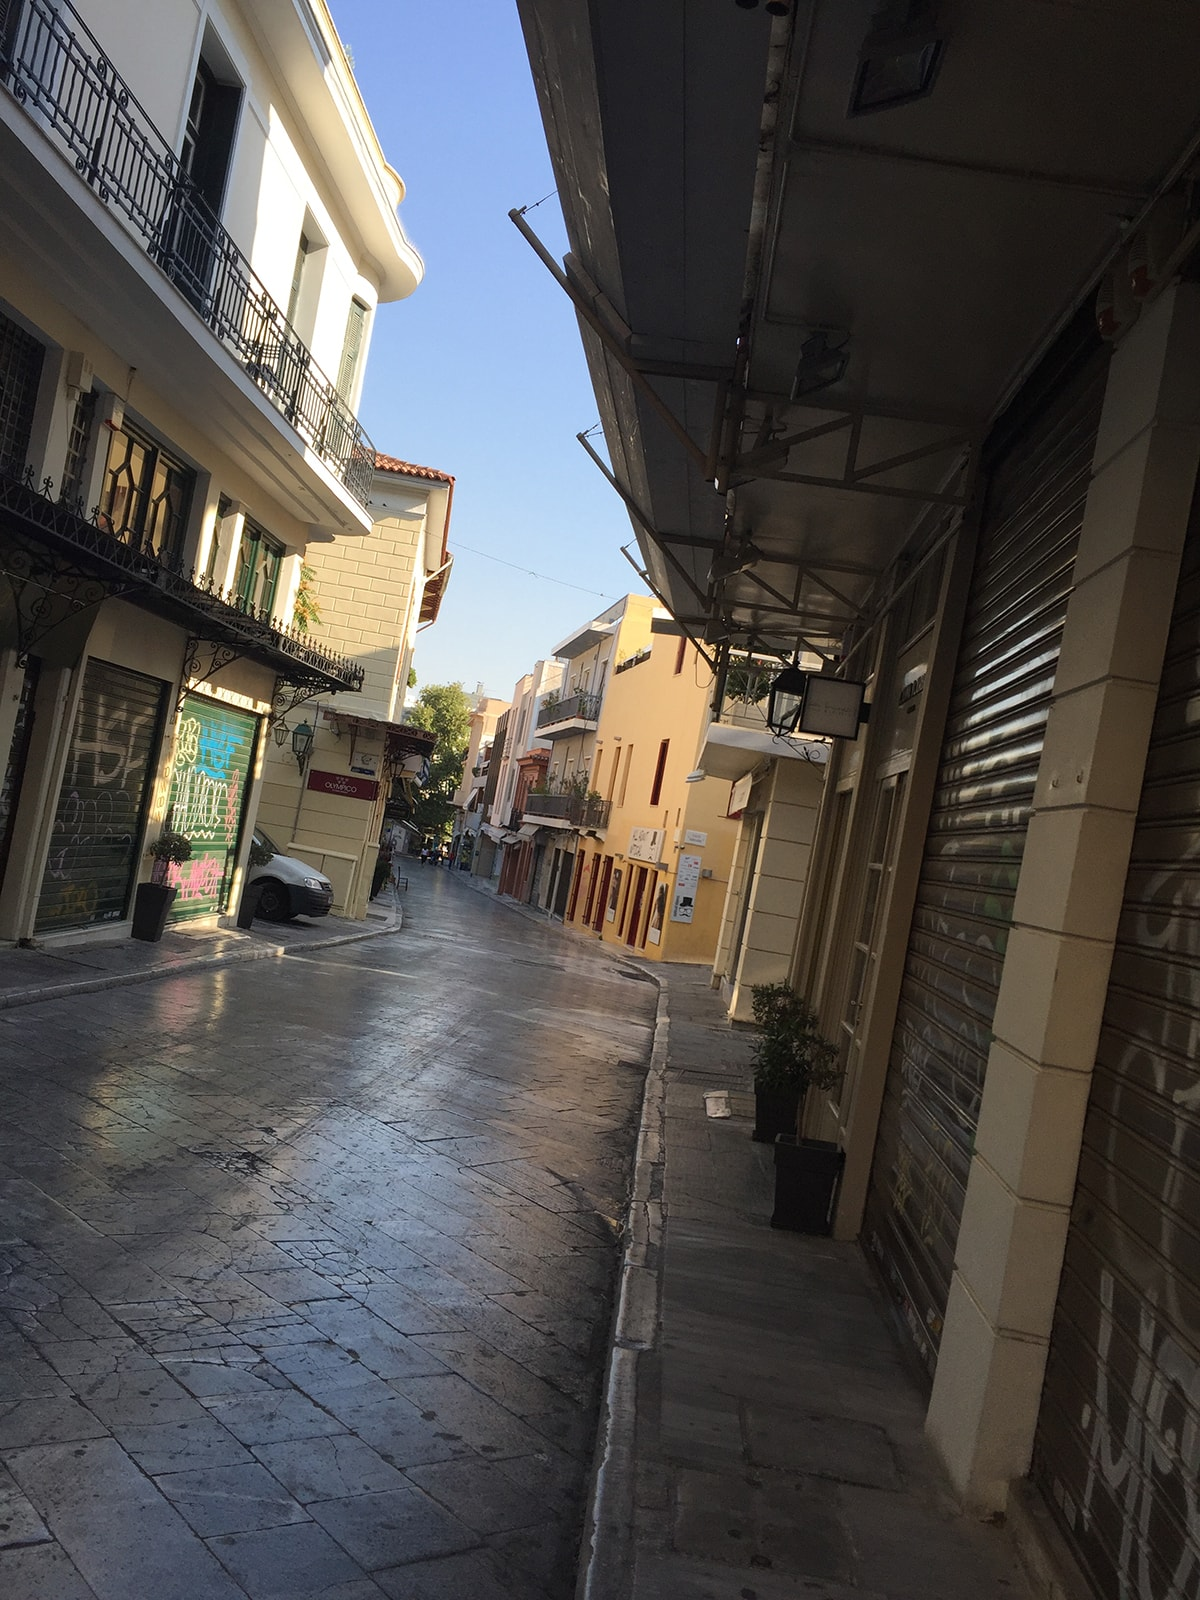 Street in the Greek neighborhood of Plaka in Athens